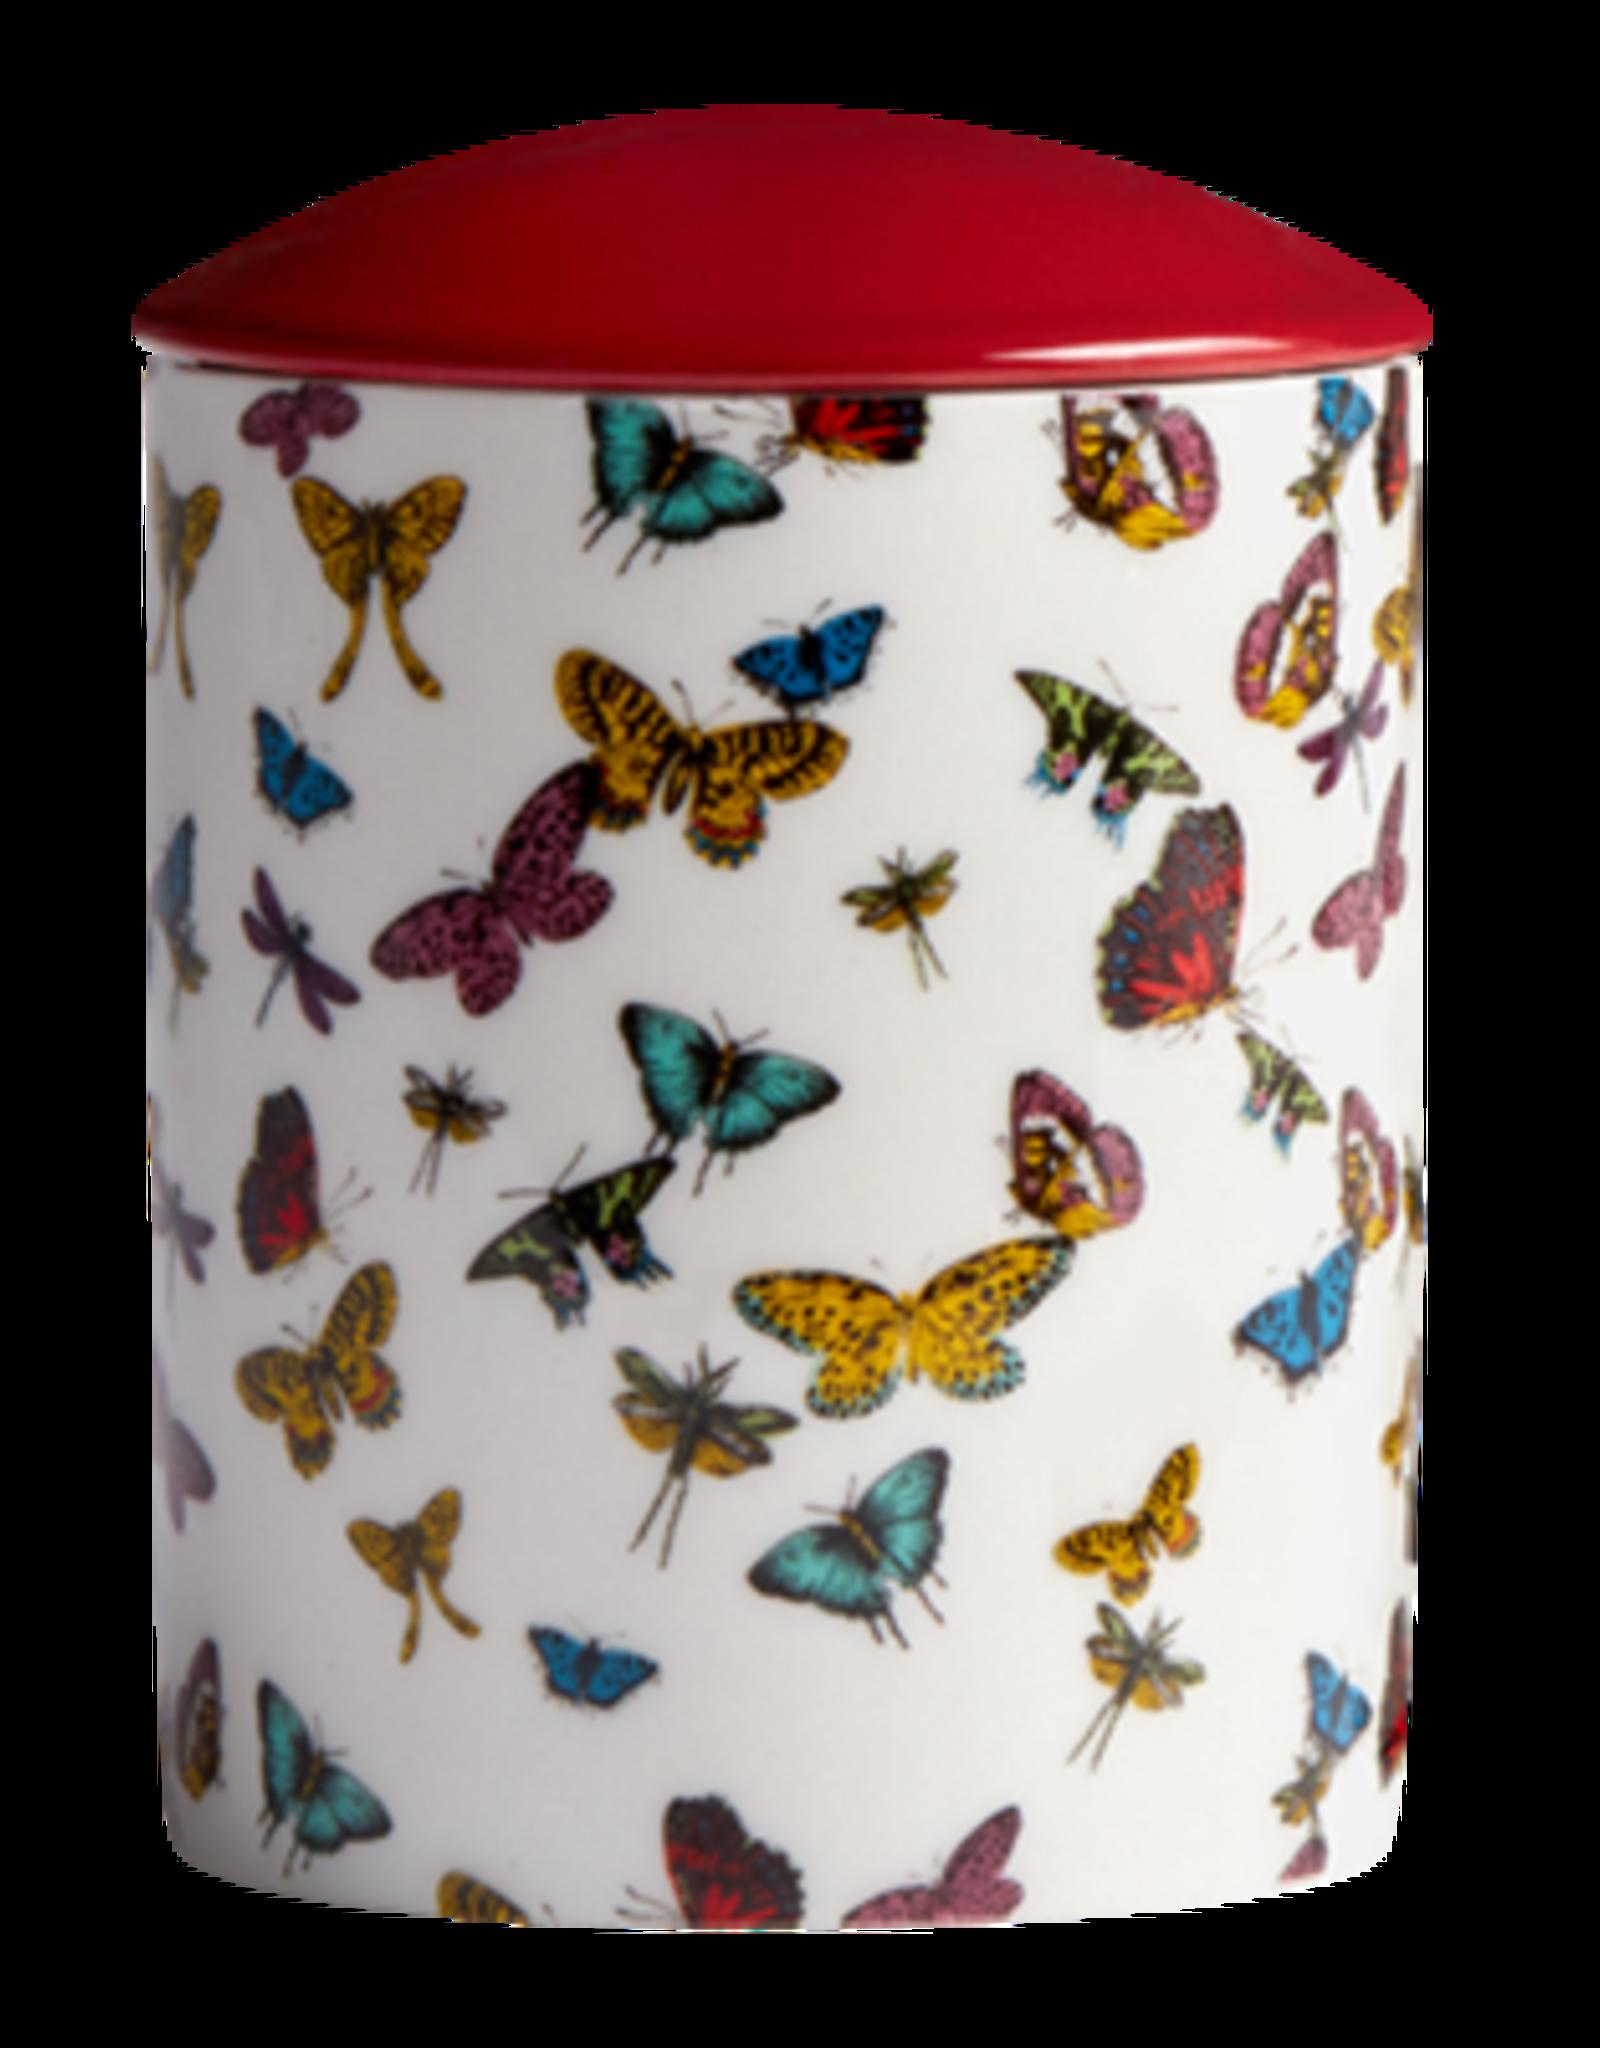 L'or de Seraphine L'or de Seraphine Medium Jar Candle BELVEDERE